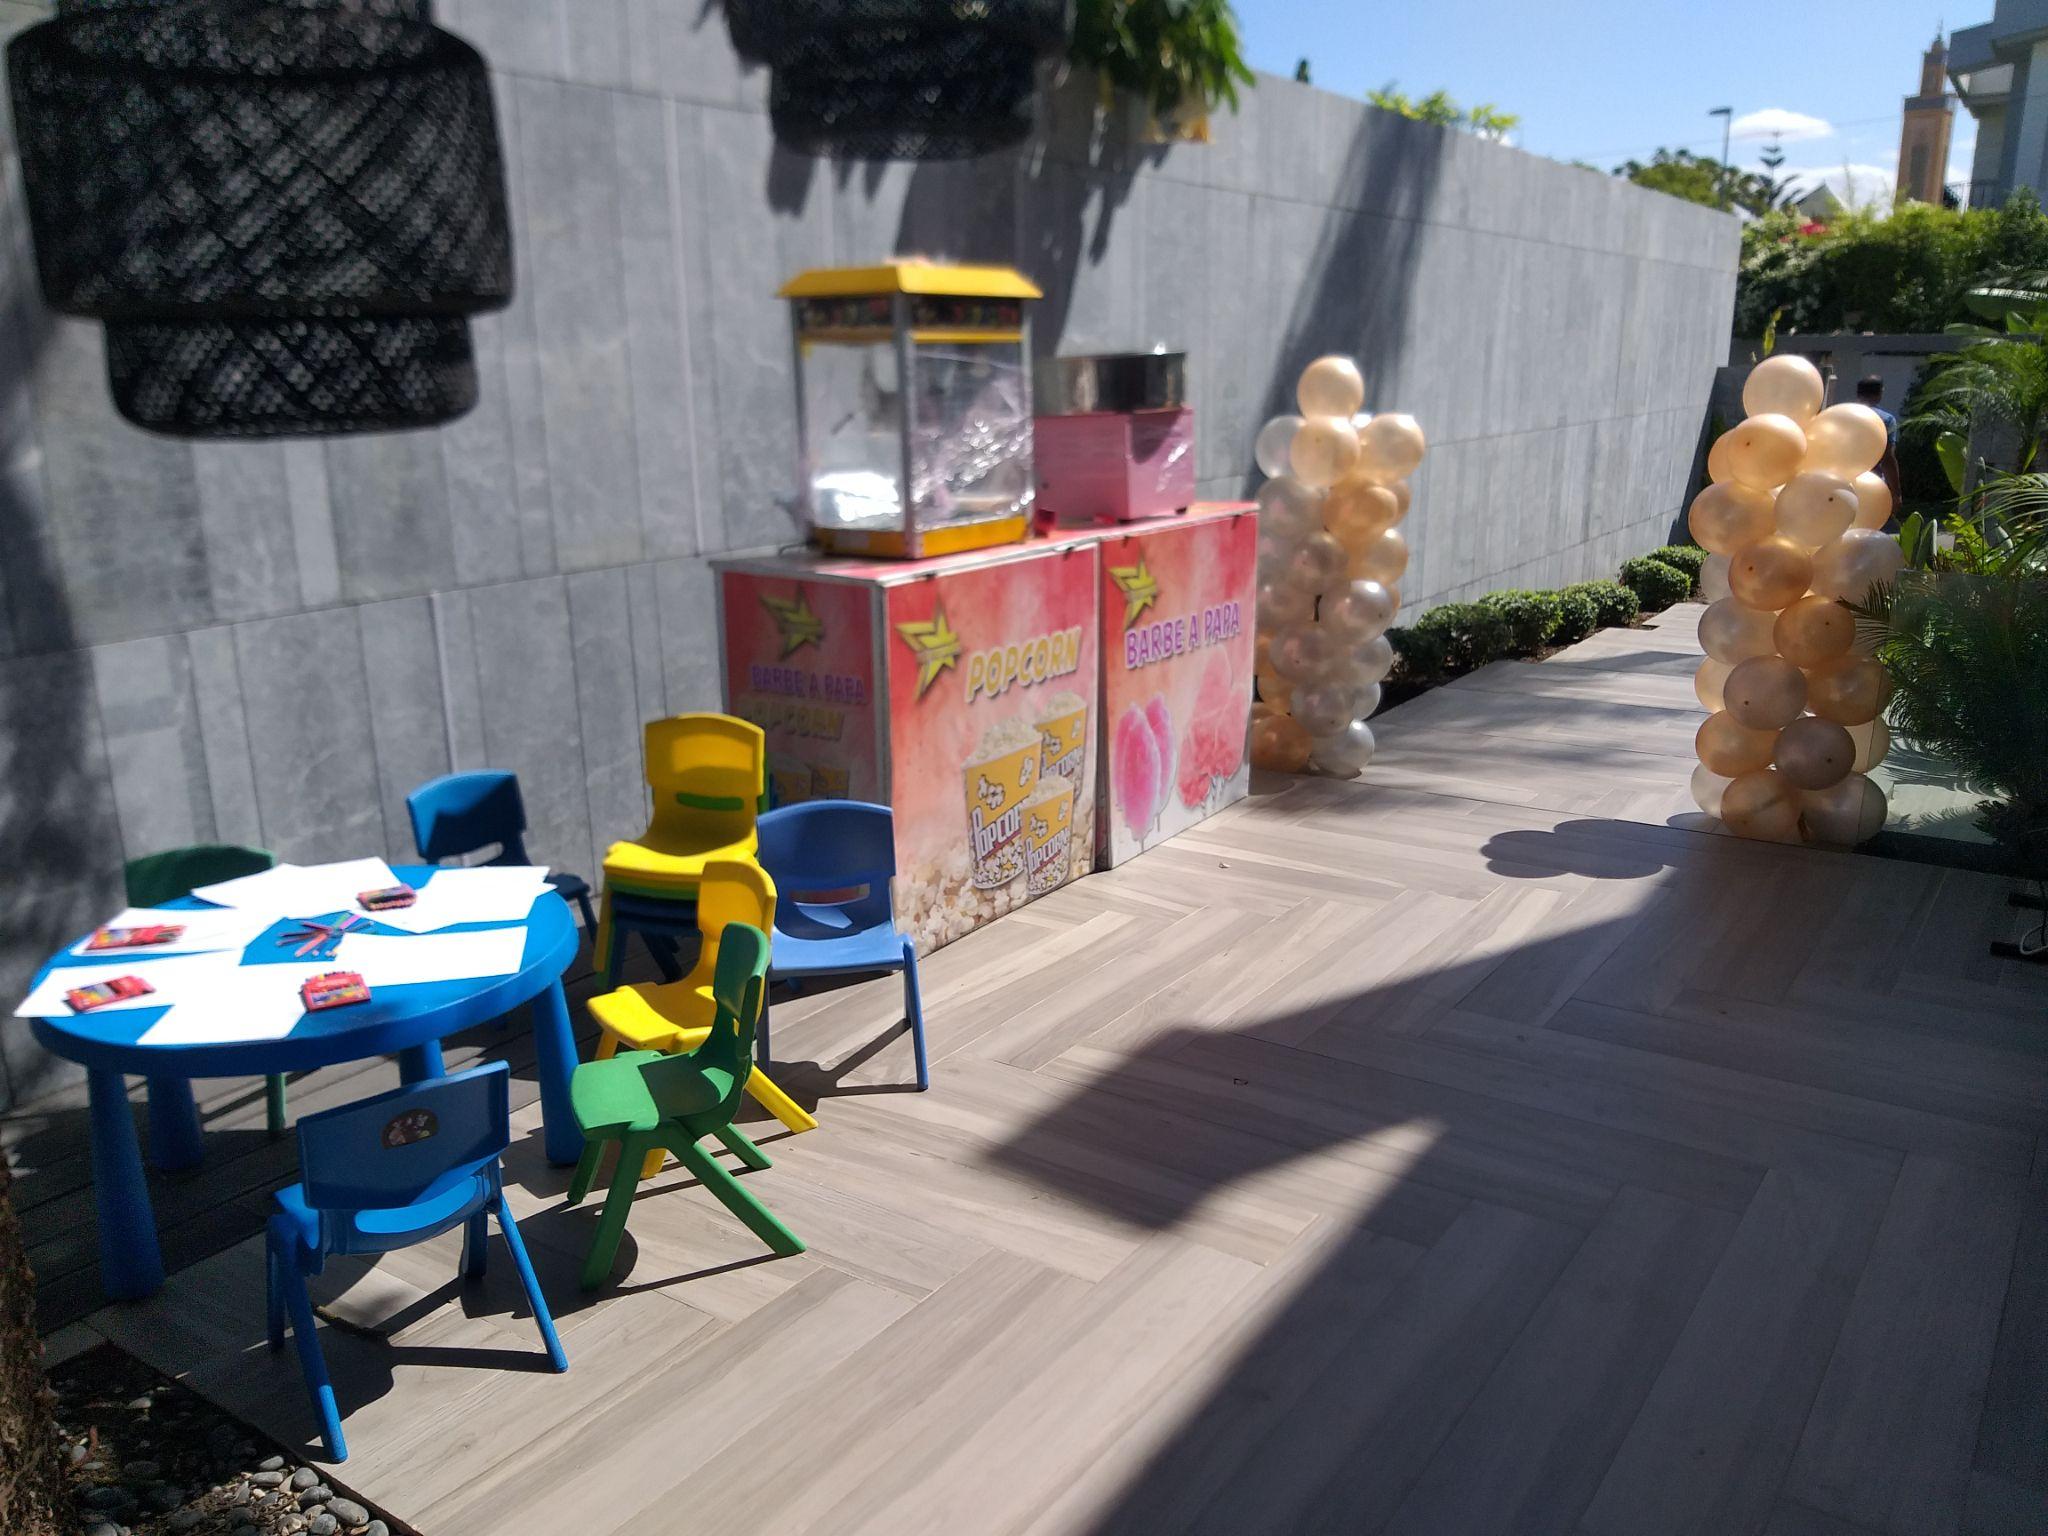 Organisation Des Anniversaires A Casablanca 0658455762 Animation Des Anniversaires A Casablanca 0658455762 In 2020 Outdoor Furniture Sets Outdoor Decor Table Decorations